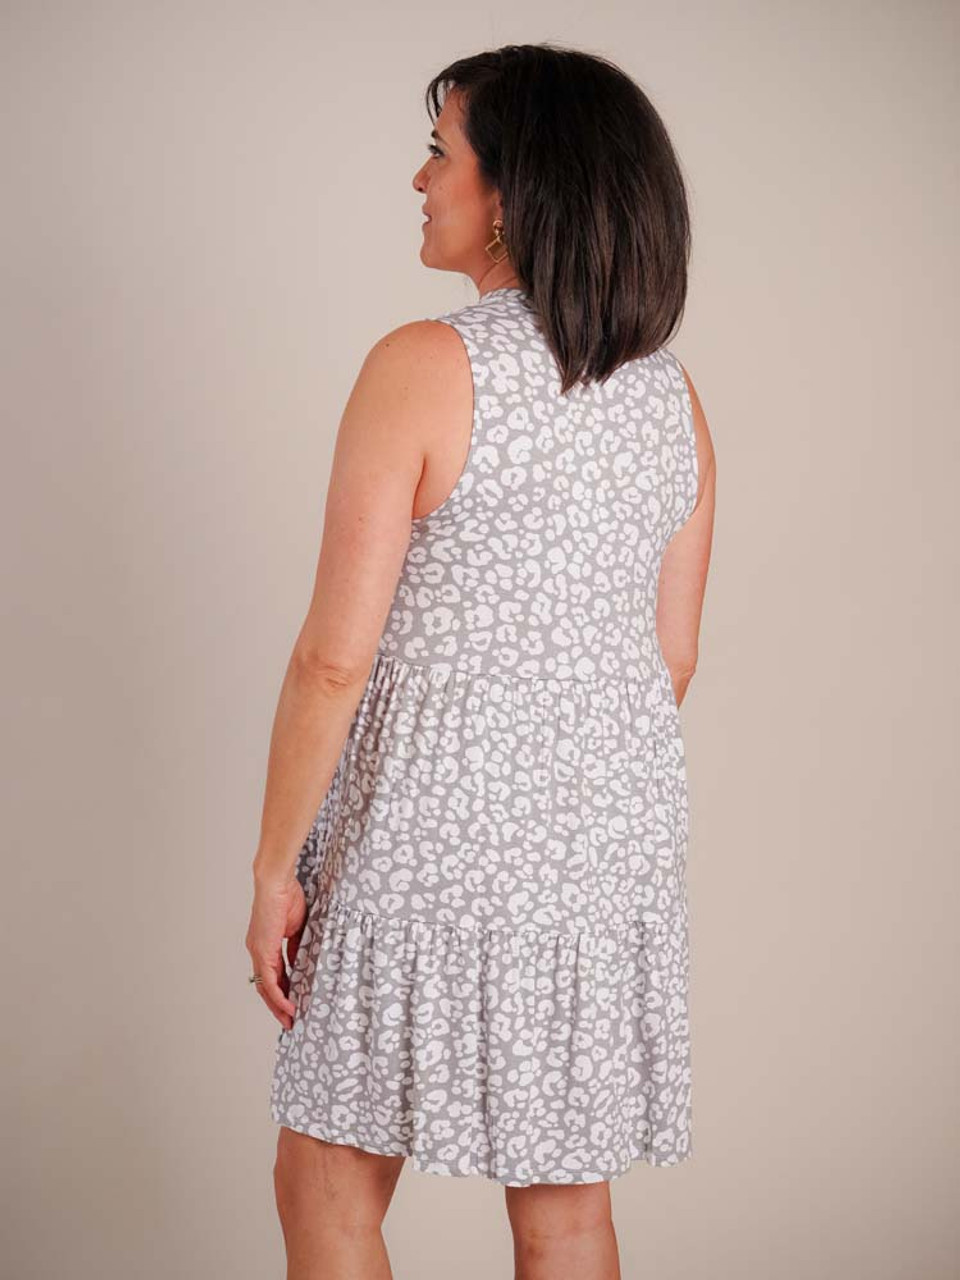 grey and white leopard print three tiered sleeveless dress Mudpie